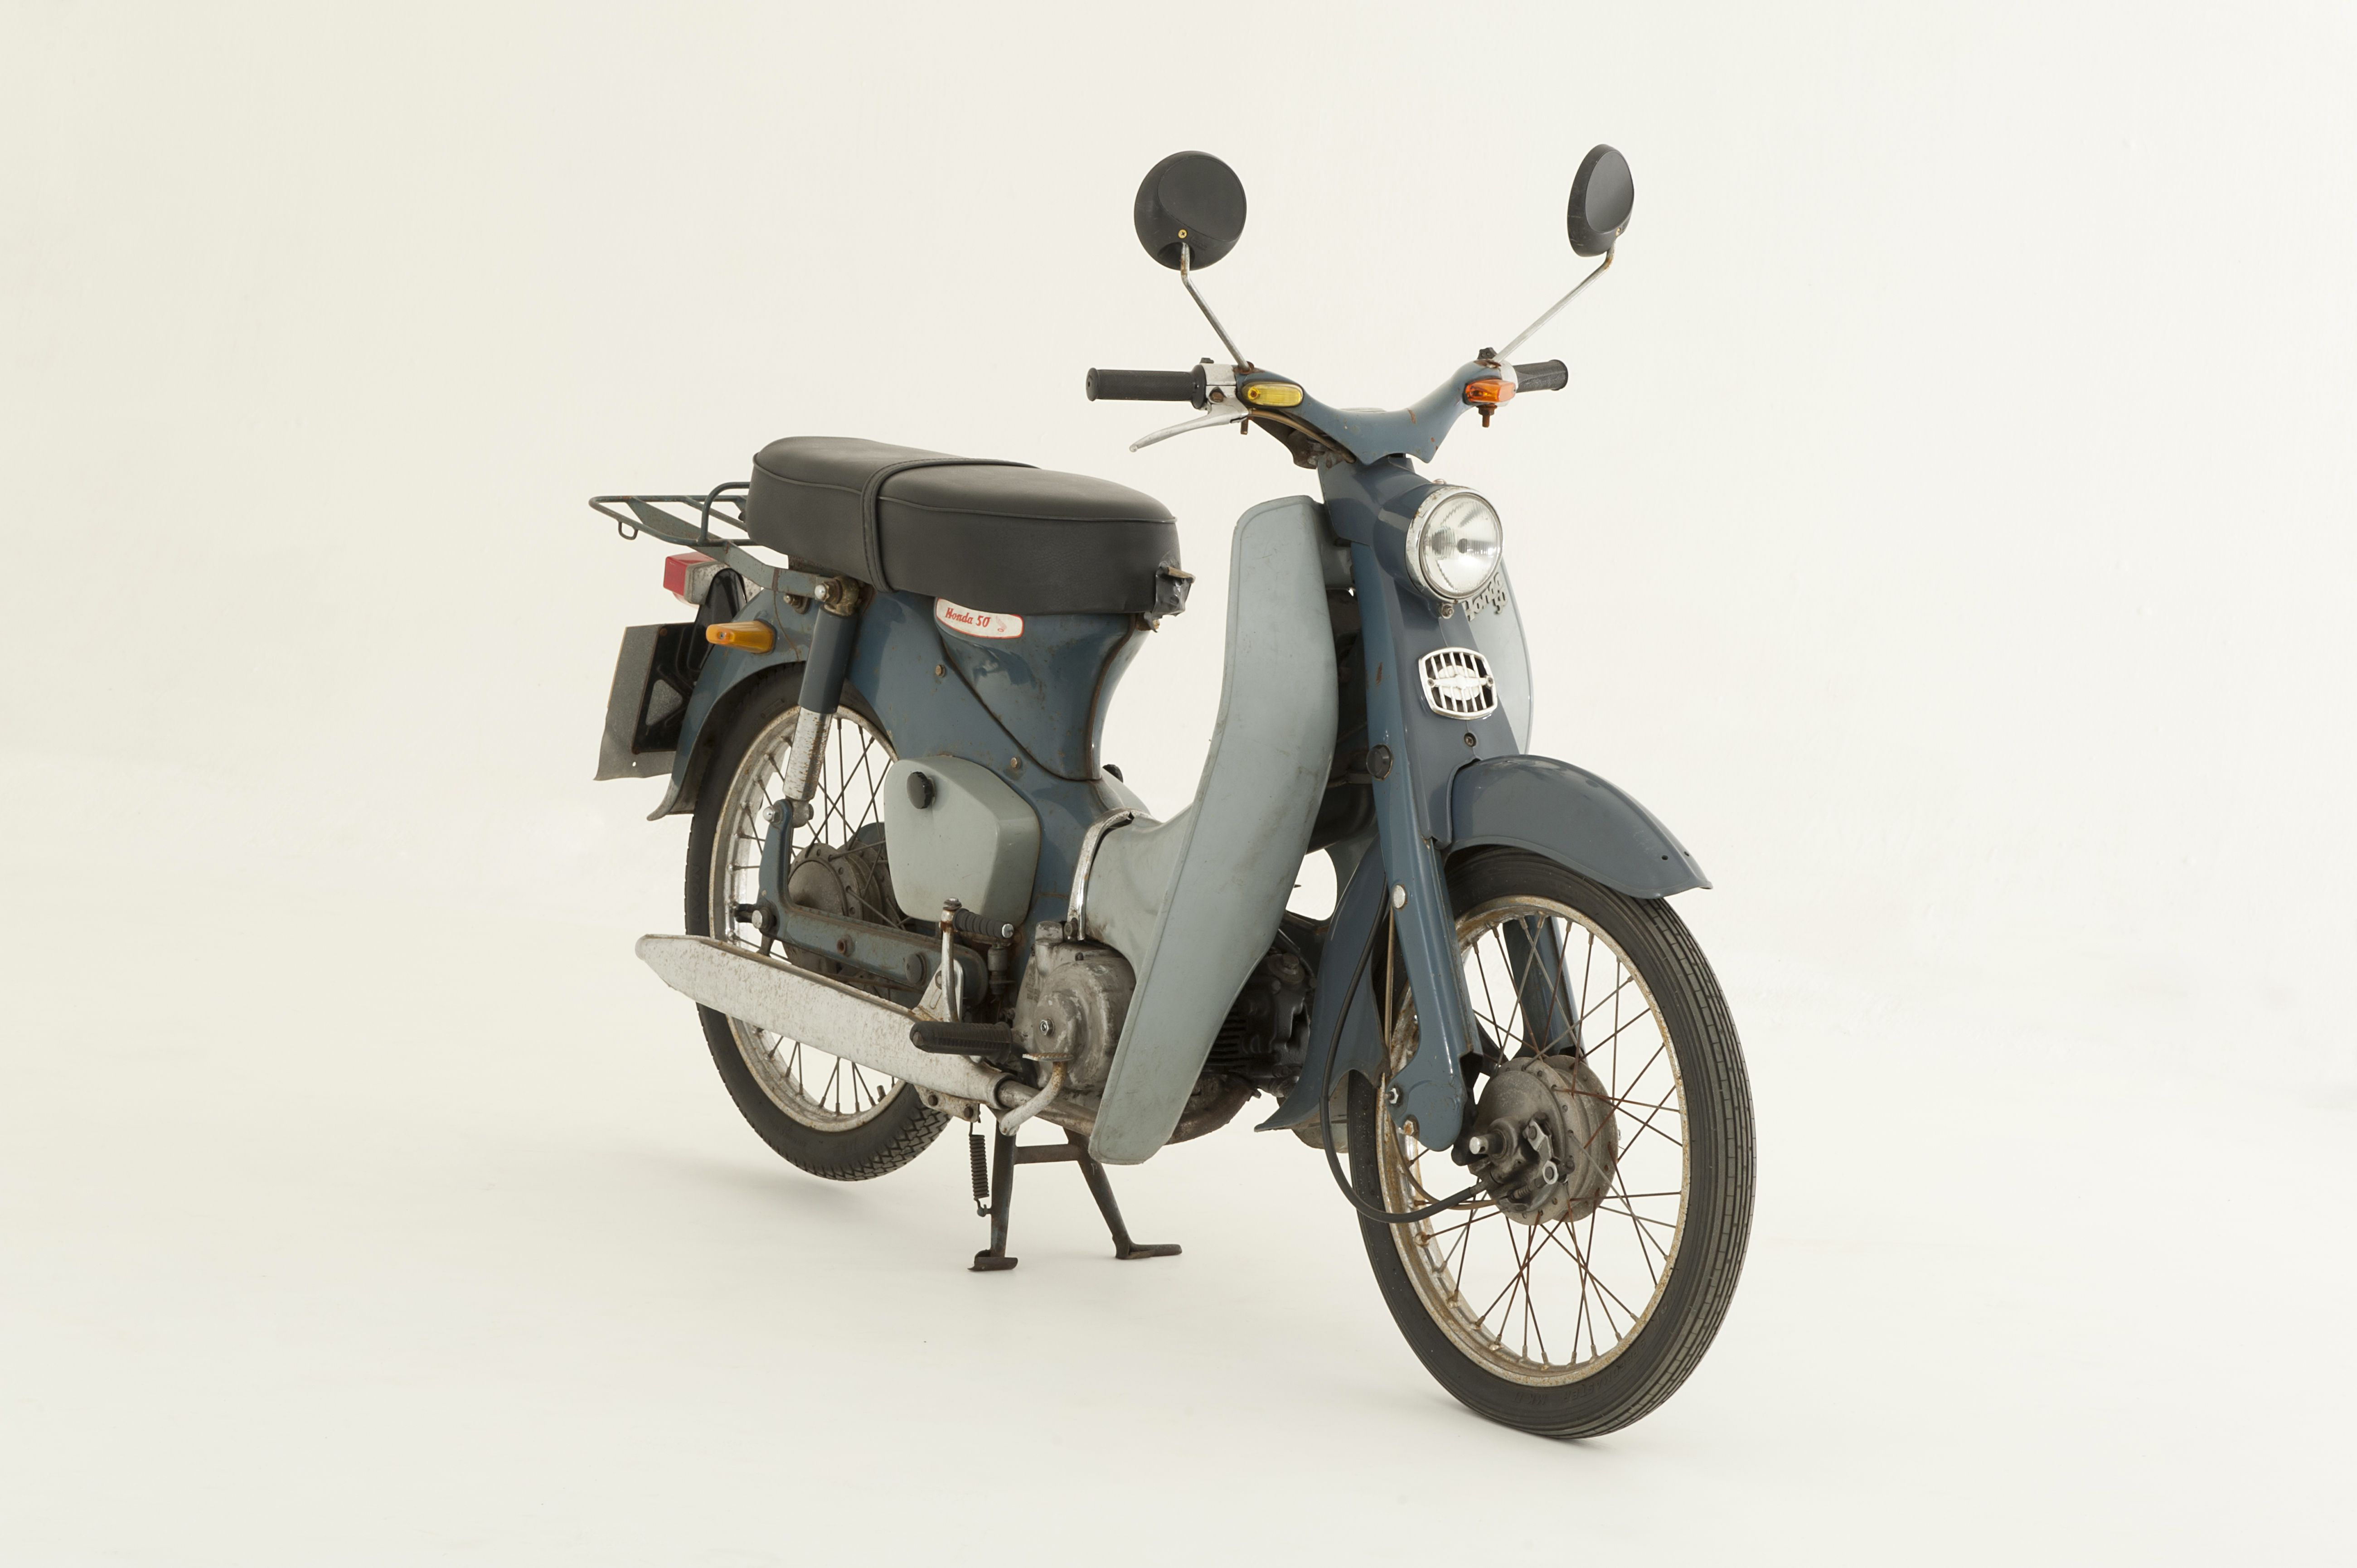 1964 Honda C50 scooter